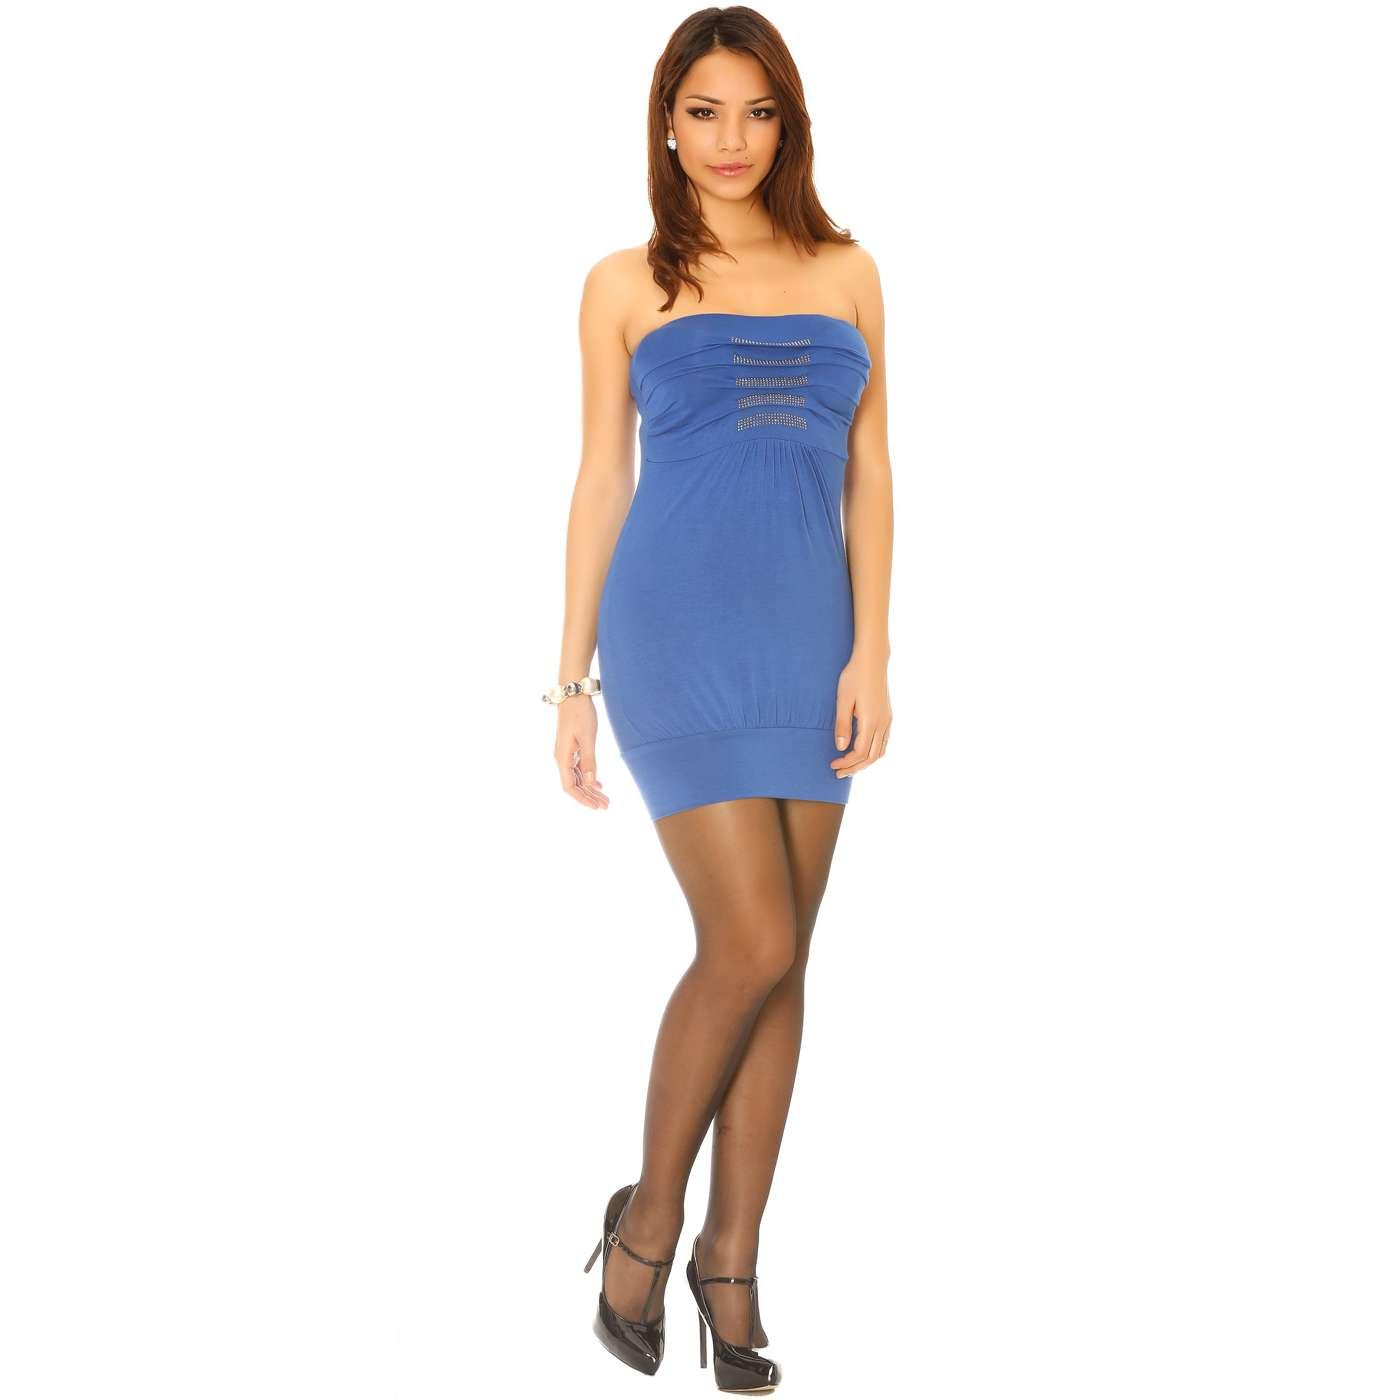 miss wear line robe courte et l g re bustier robe d 39 t bleu roi strass. Black Bedroom Furniture Sets. Home Design Ideas